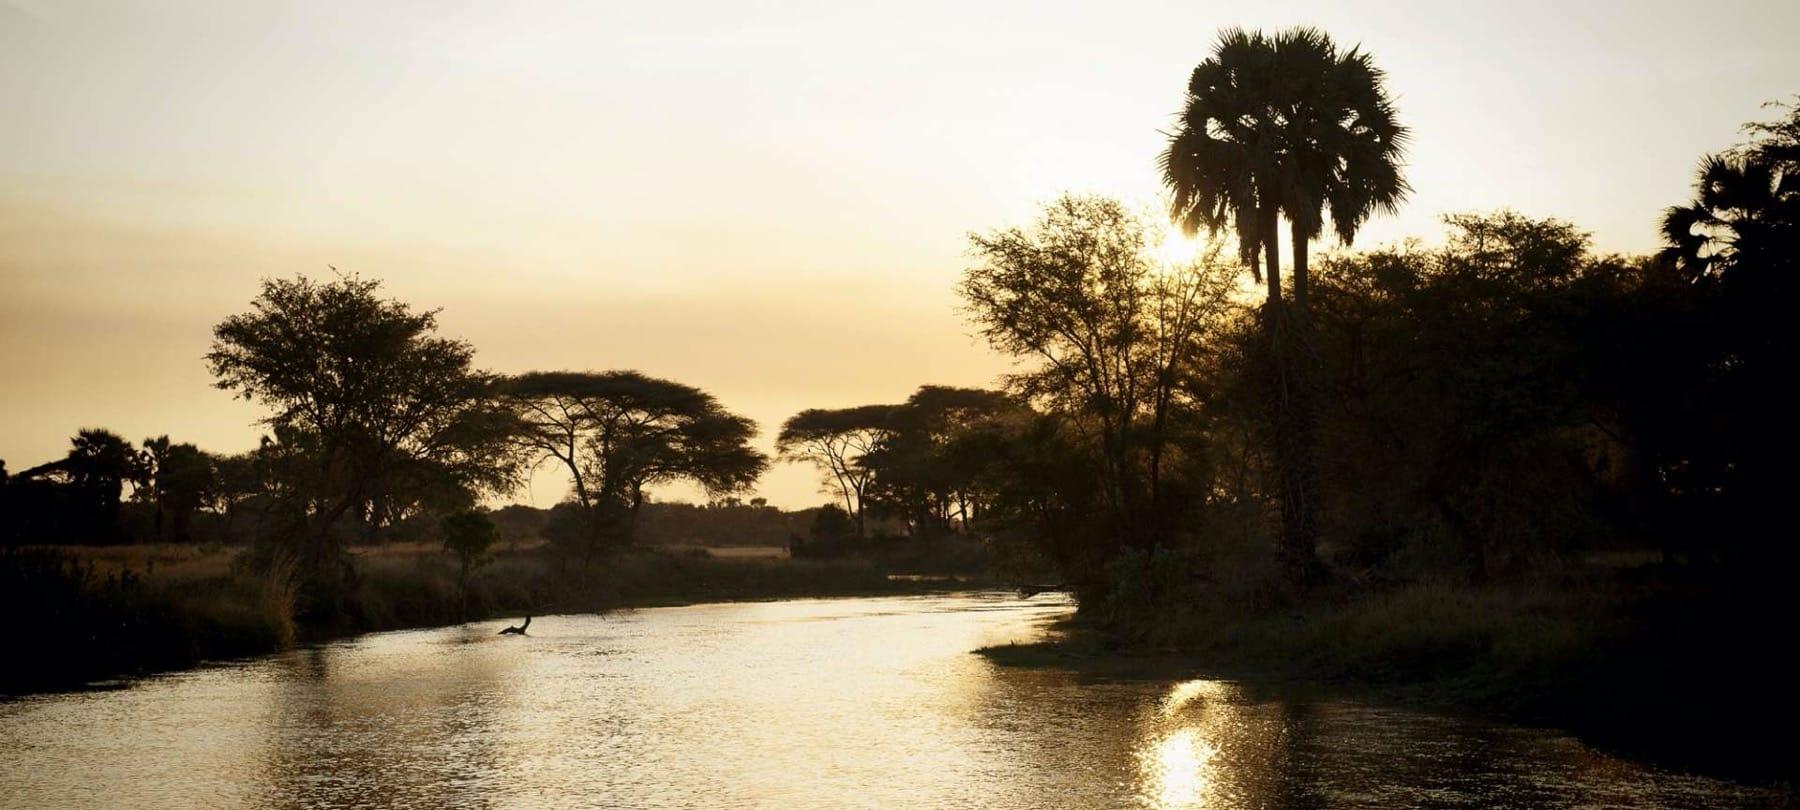 The Katavi region is aa pristine wilderness destination in Tanzania